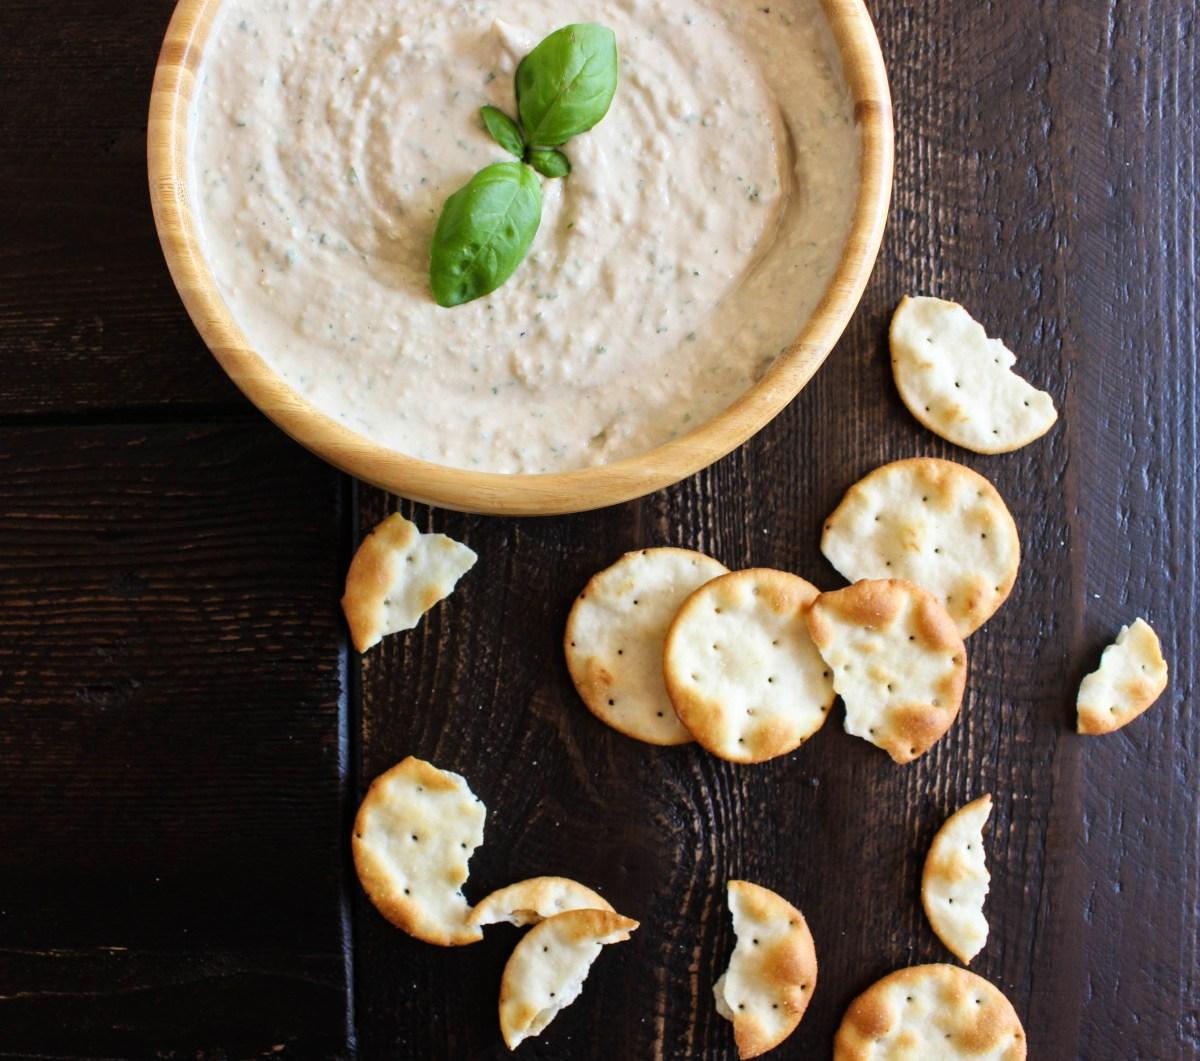 Garlicky White Bean & Basil Hummus